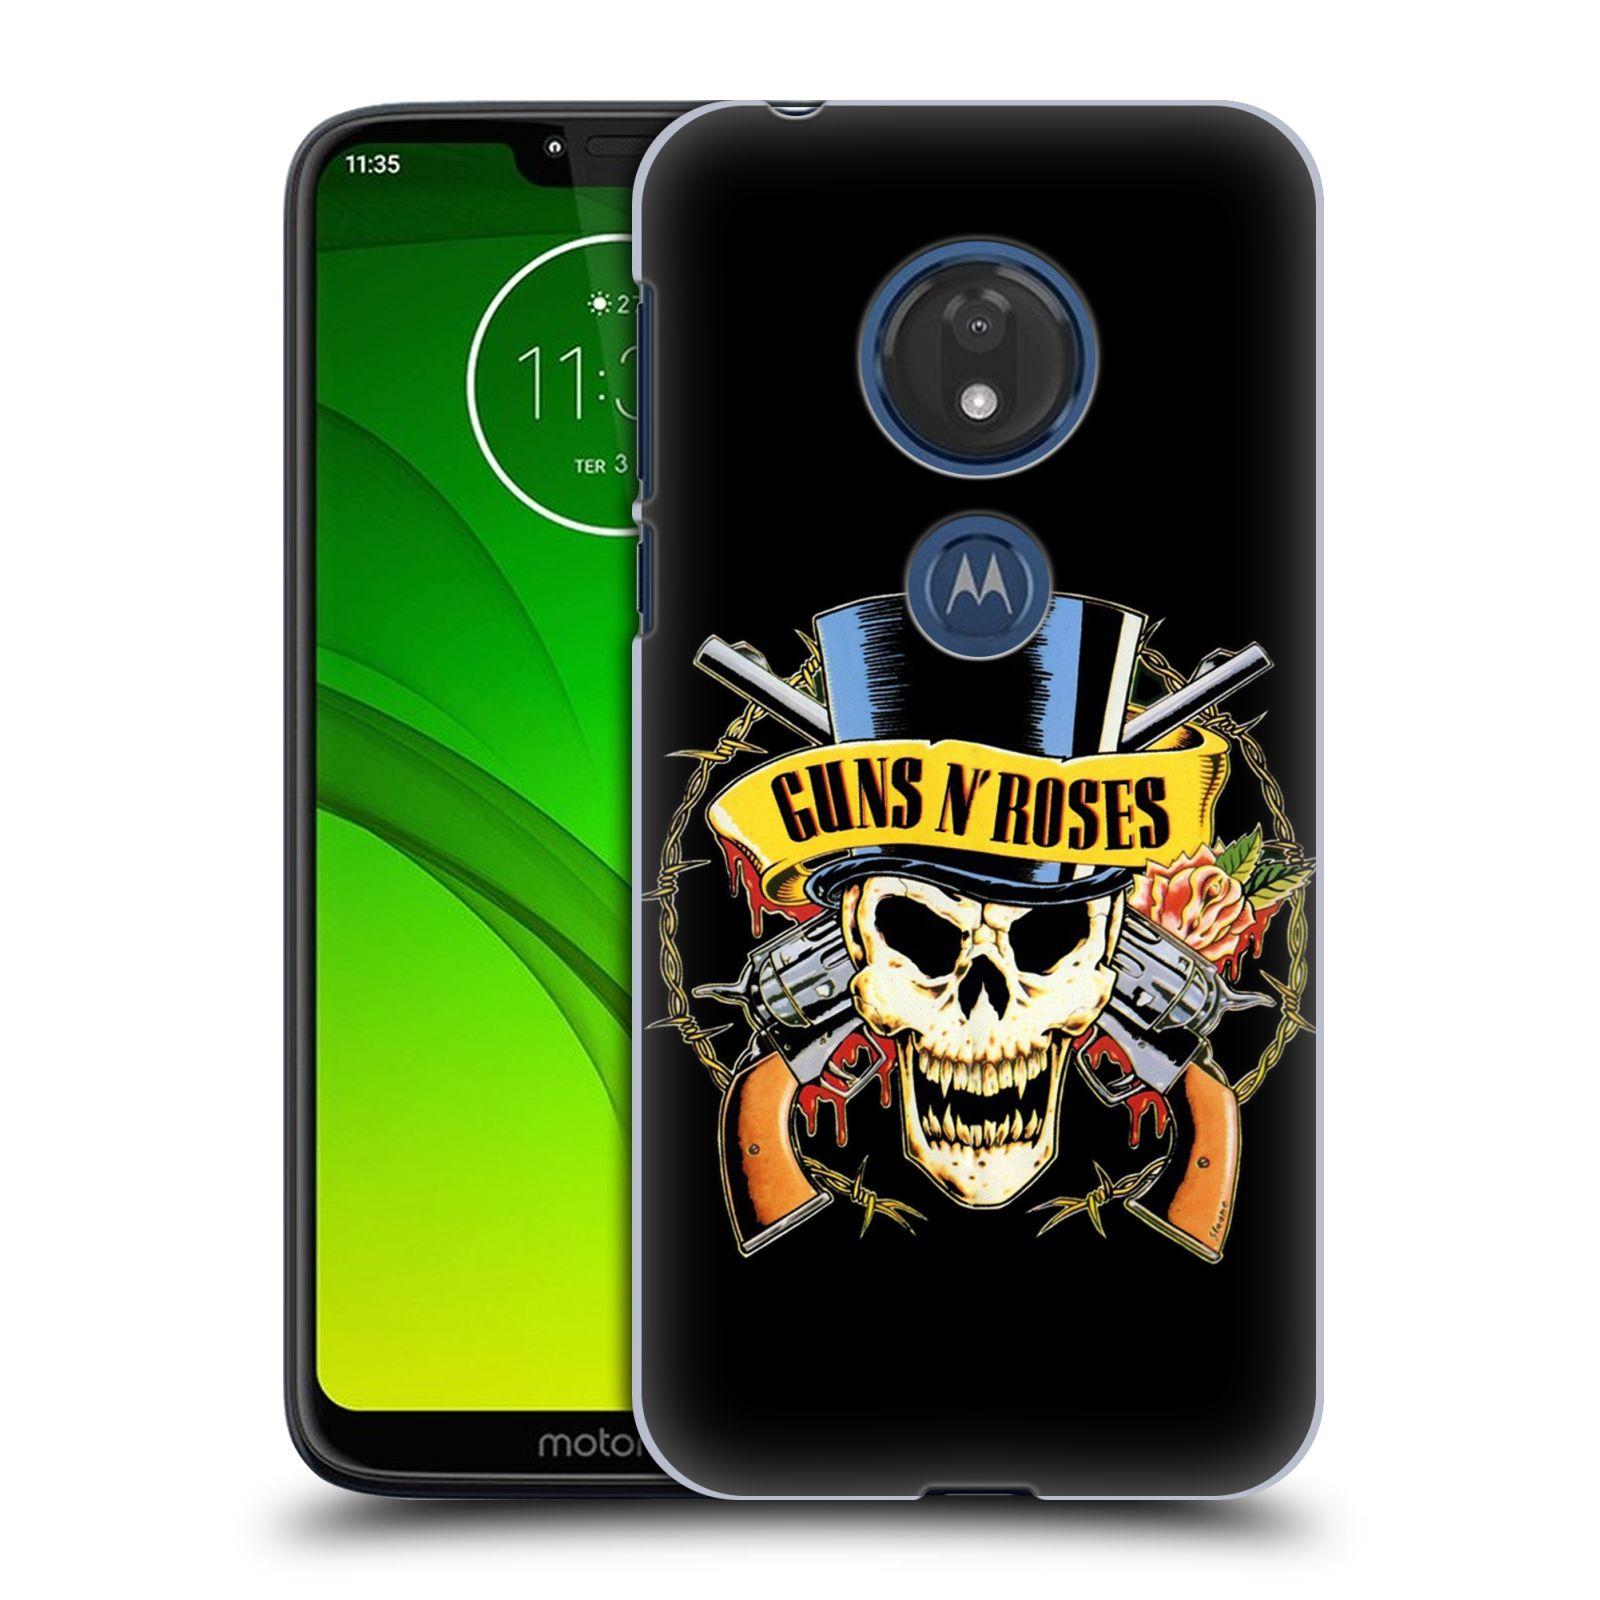 Plastové pouzdro na mobil Motorola Moto G7 Play - Head Case - Guns N' Roses - Lebka